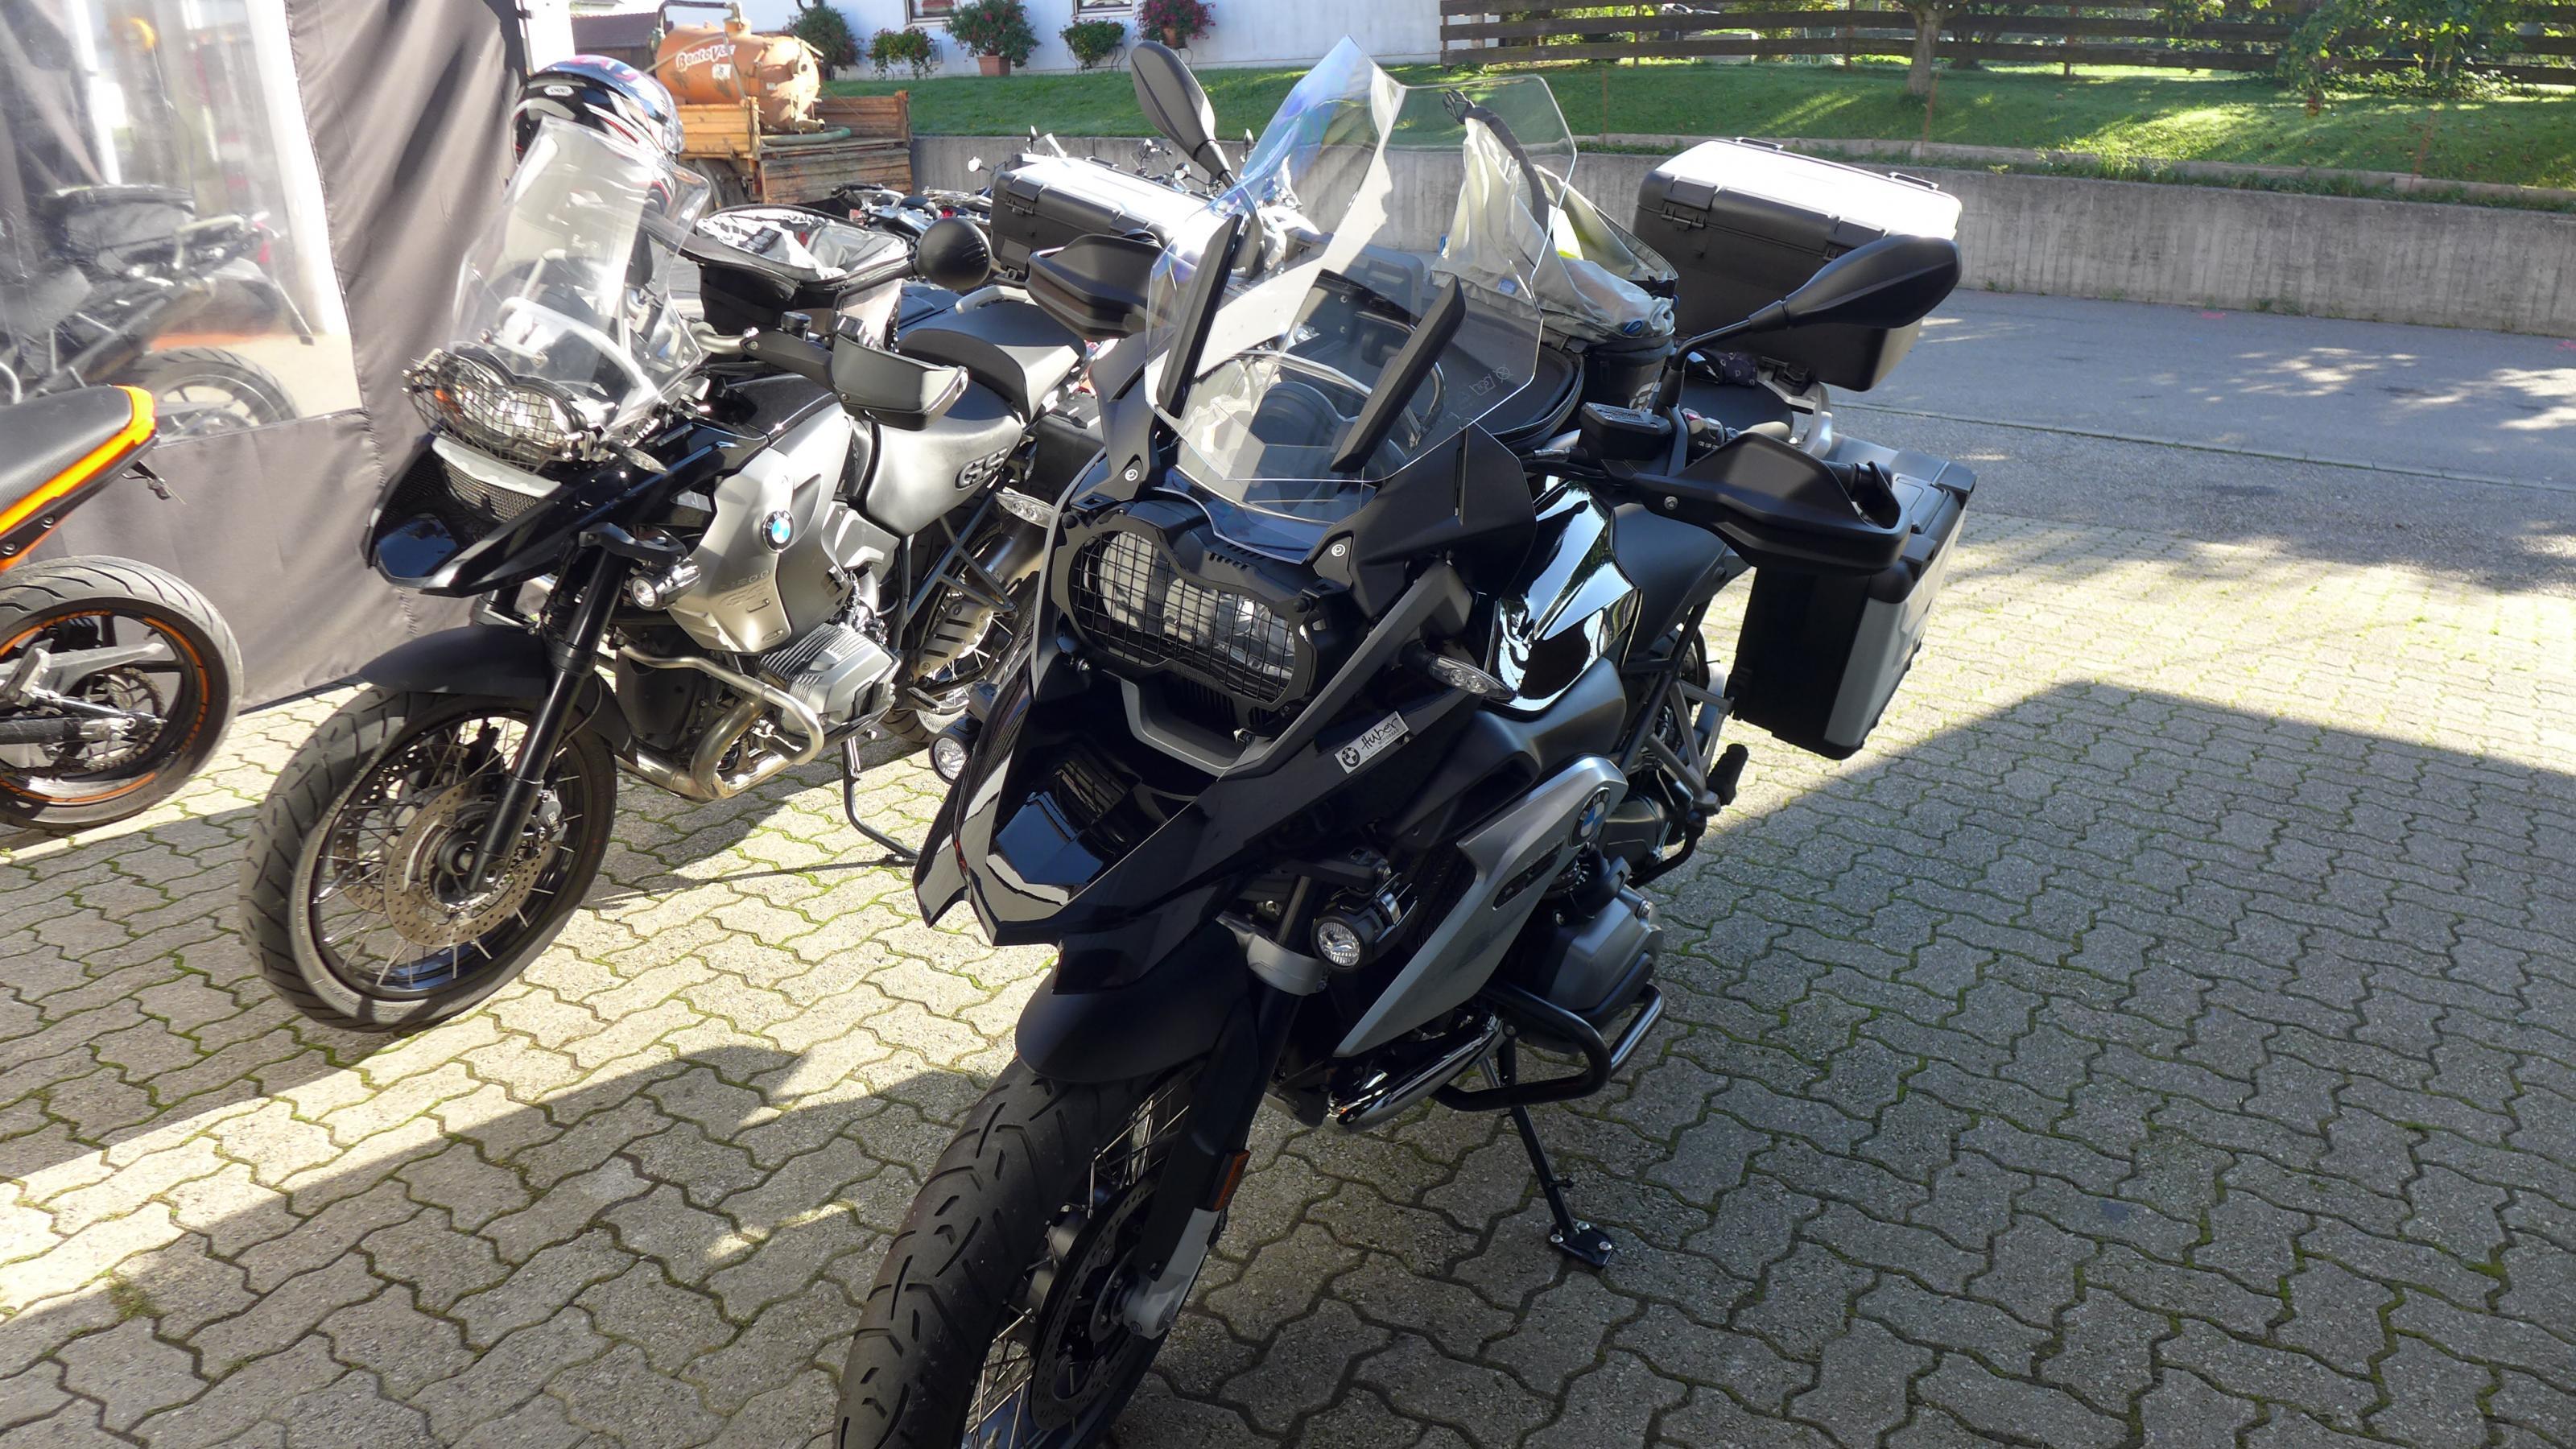 modell r 1200 gs